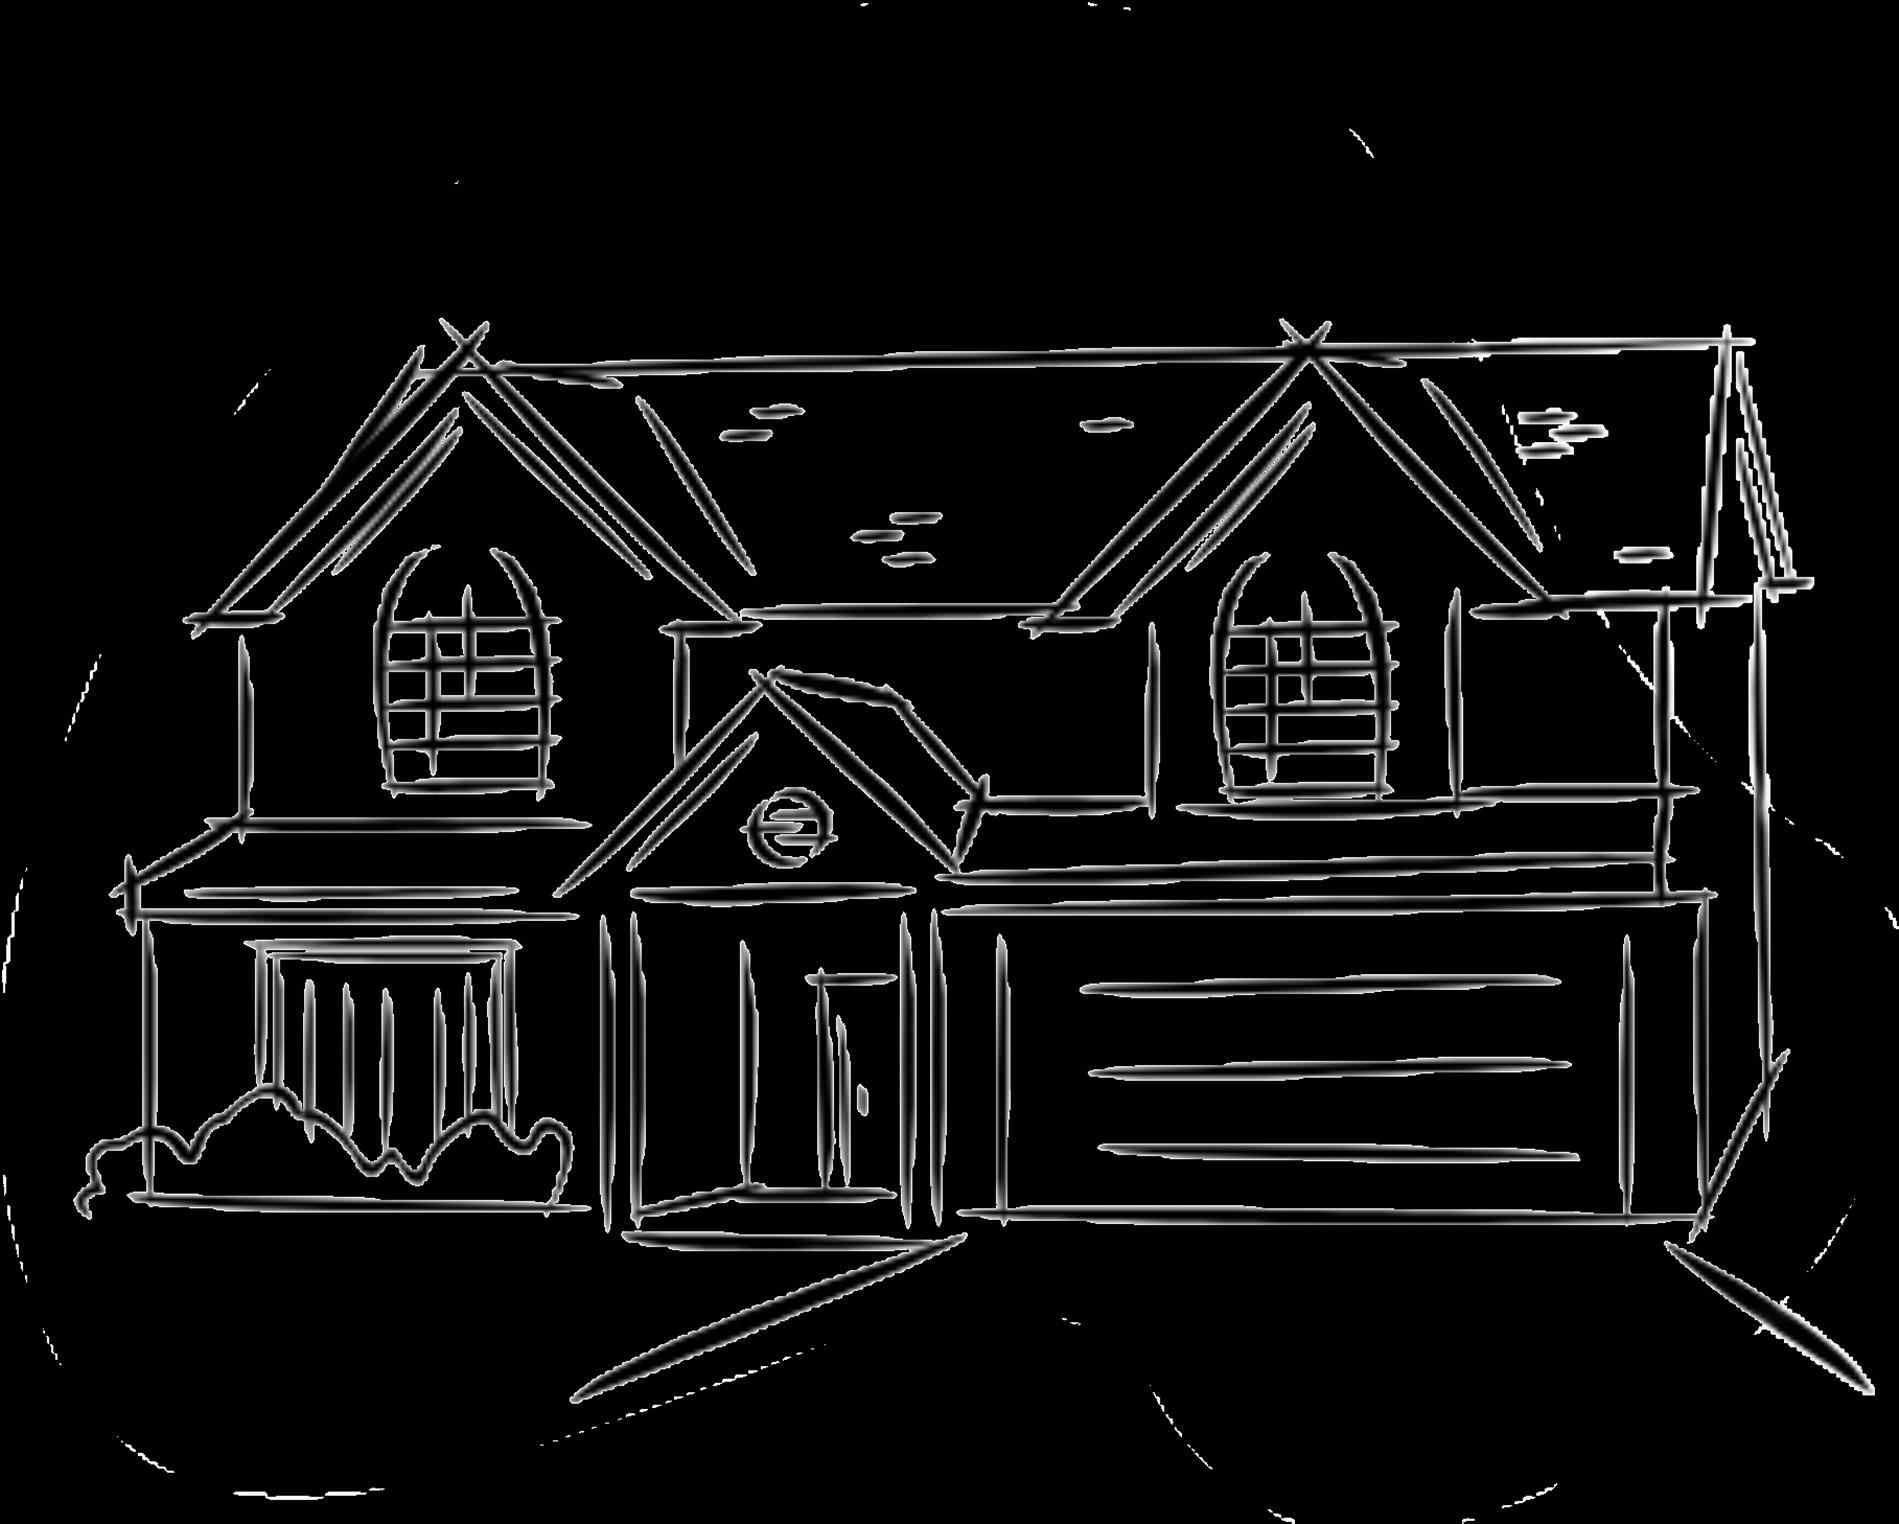 Outline Design Nyfarmsinfo Black U Modern Black House Drawing Outline U Modern Clipart Georgian Clipart Ho House Sketch Dream House Sketch Simple House Drawing